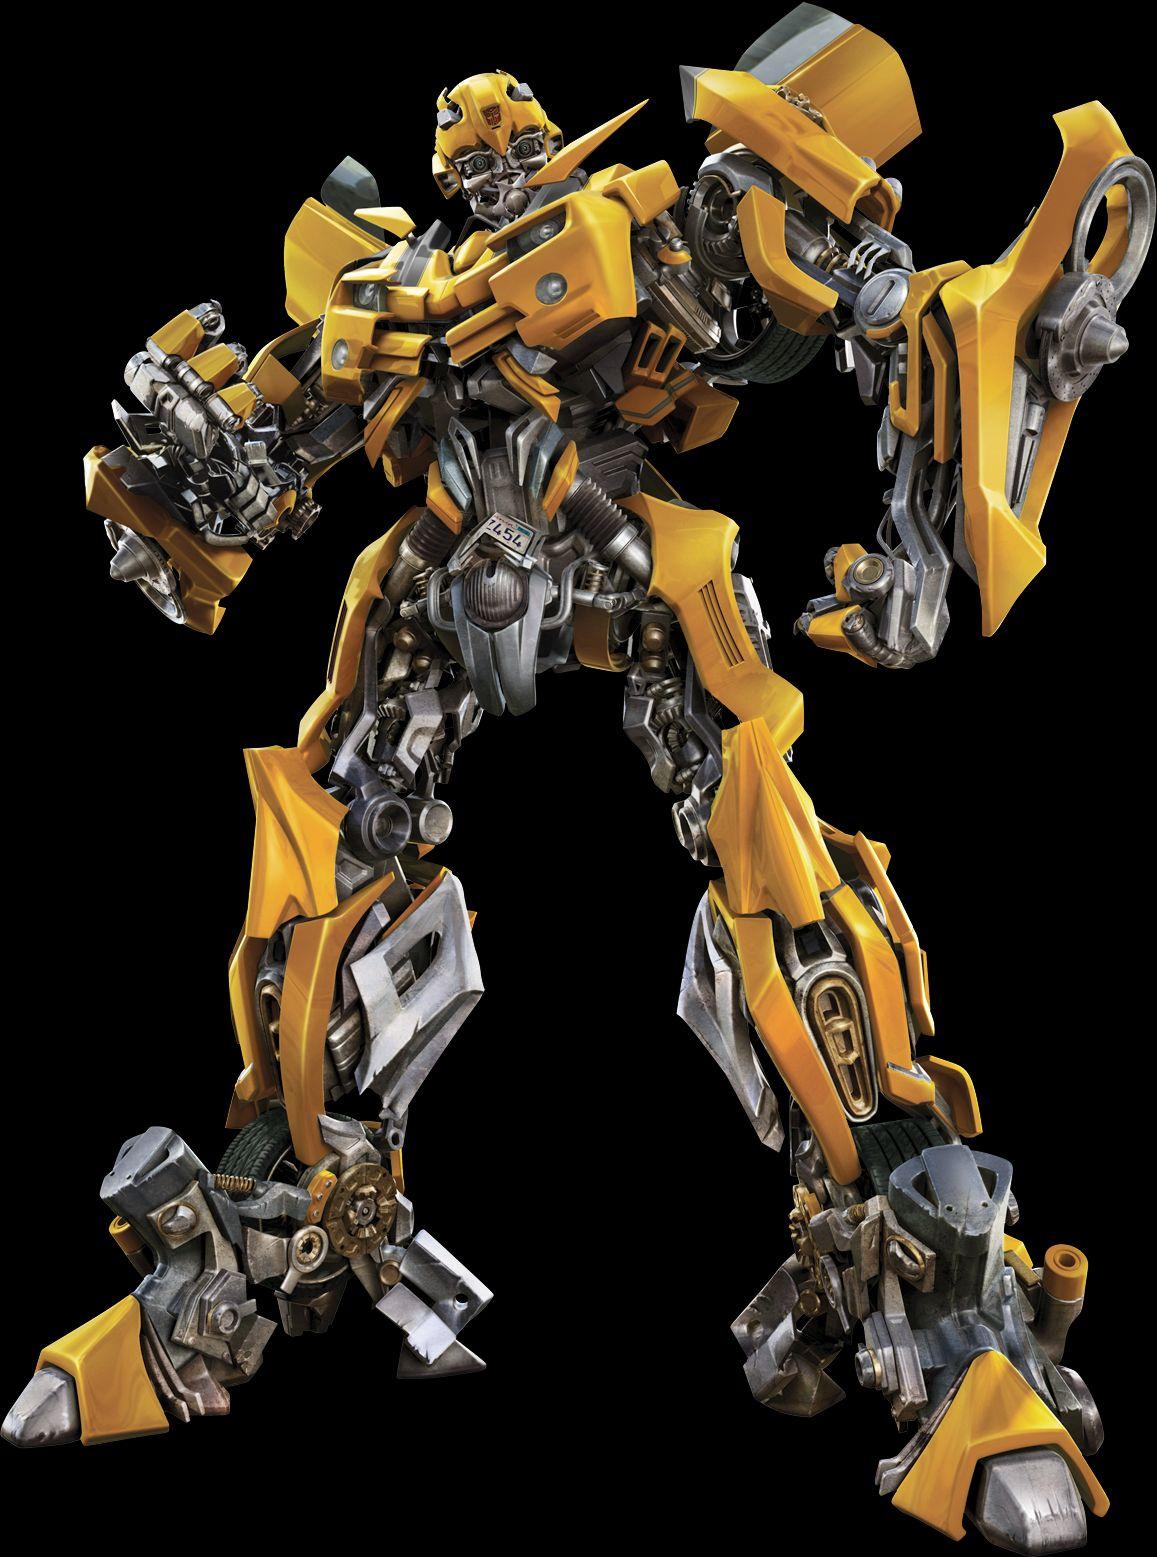 image bumblebee png slush invaders wiki fandom powered by wikia